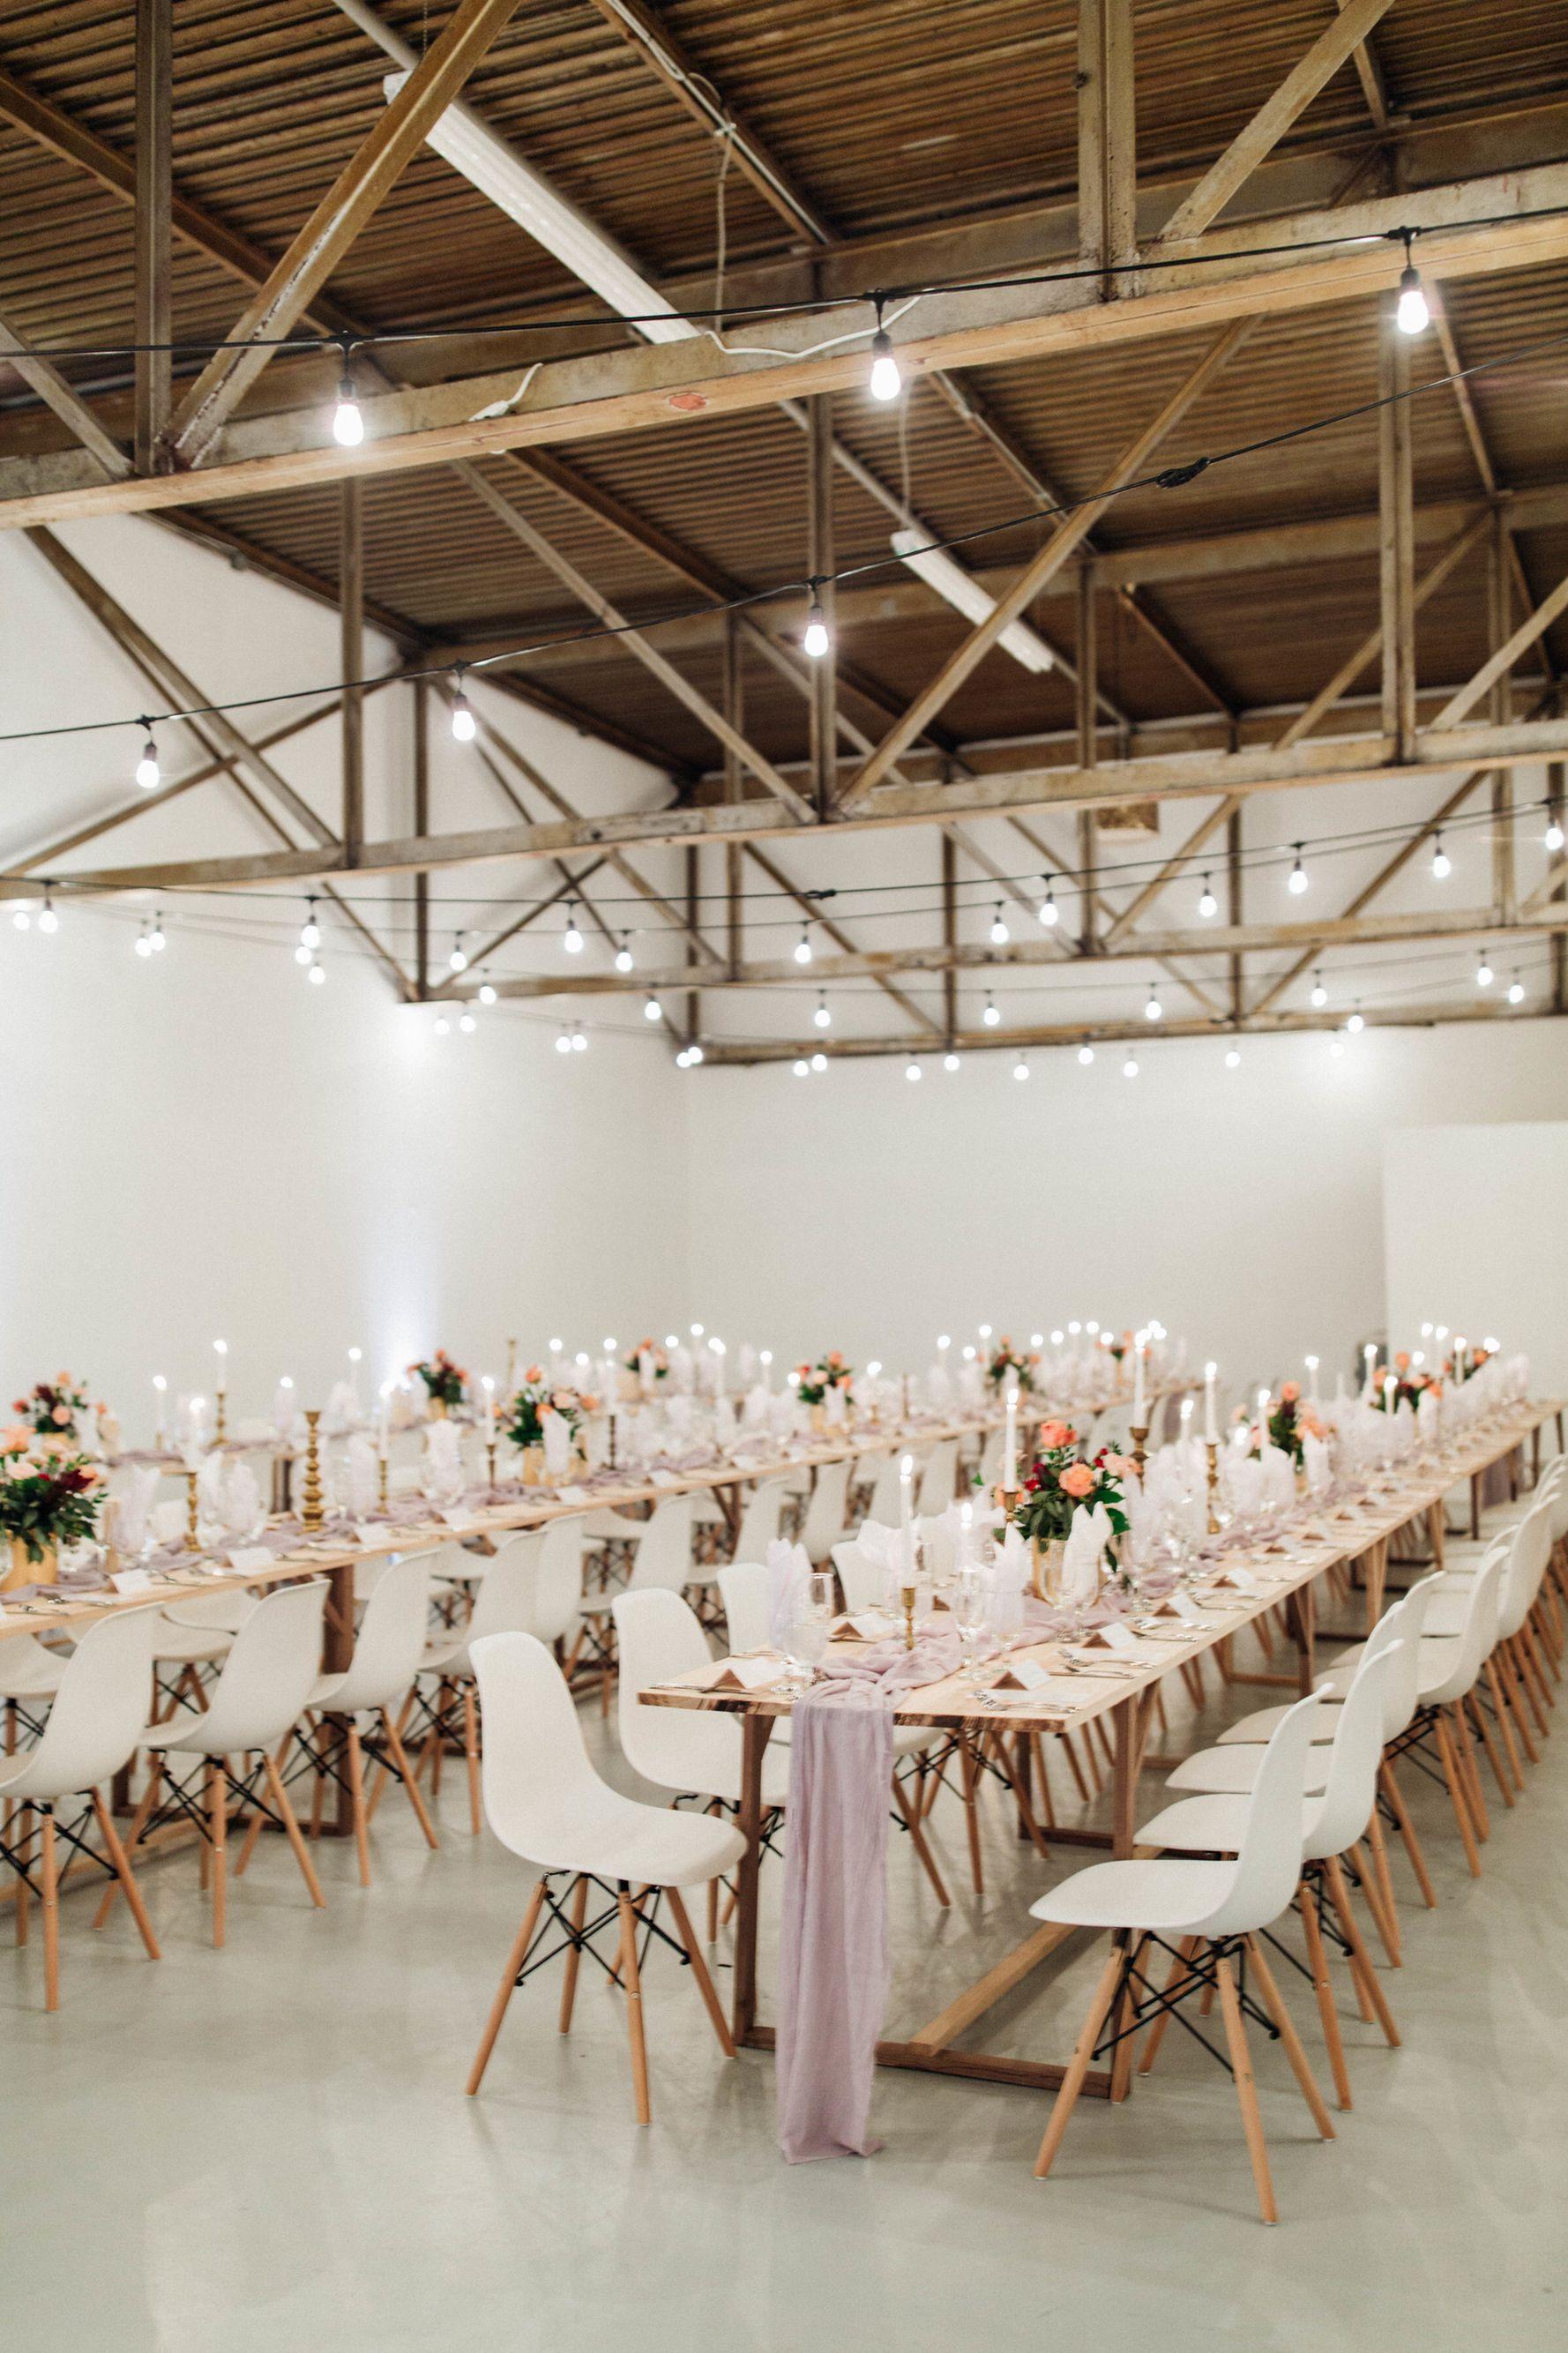 Modern Wedding Venue Six Hundred King Jacksonville Fl Industrial Warehouse Photo By Christ Modern Wedding Venue Florida Wedding Venues Wedding Venues